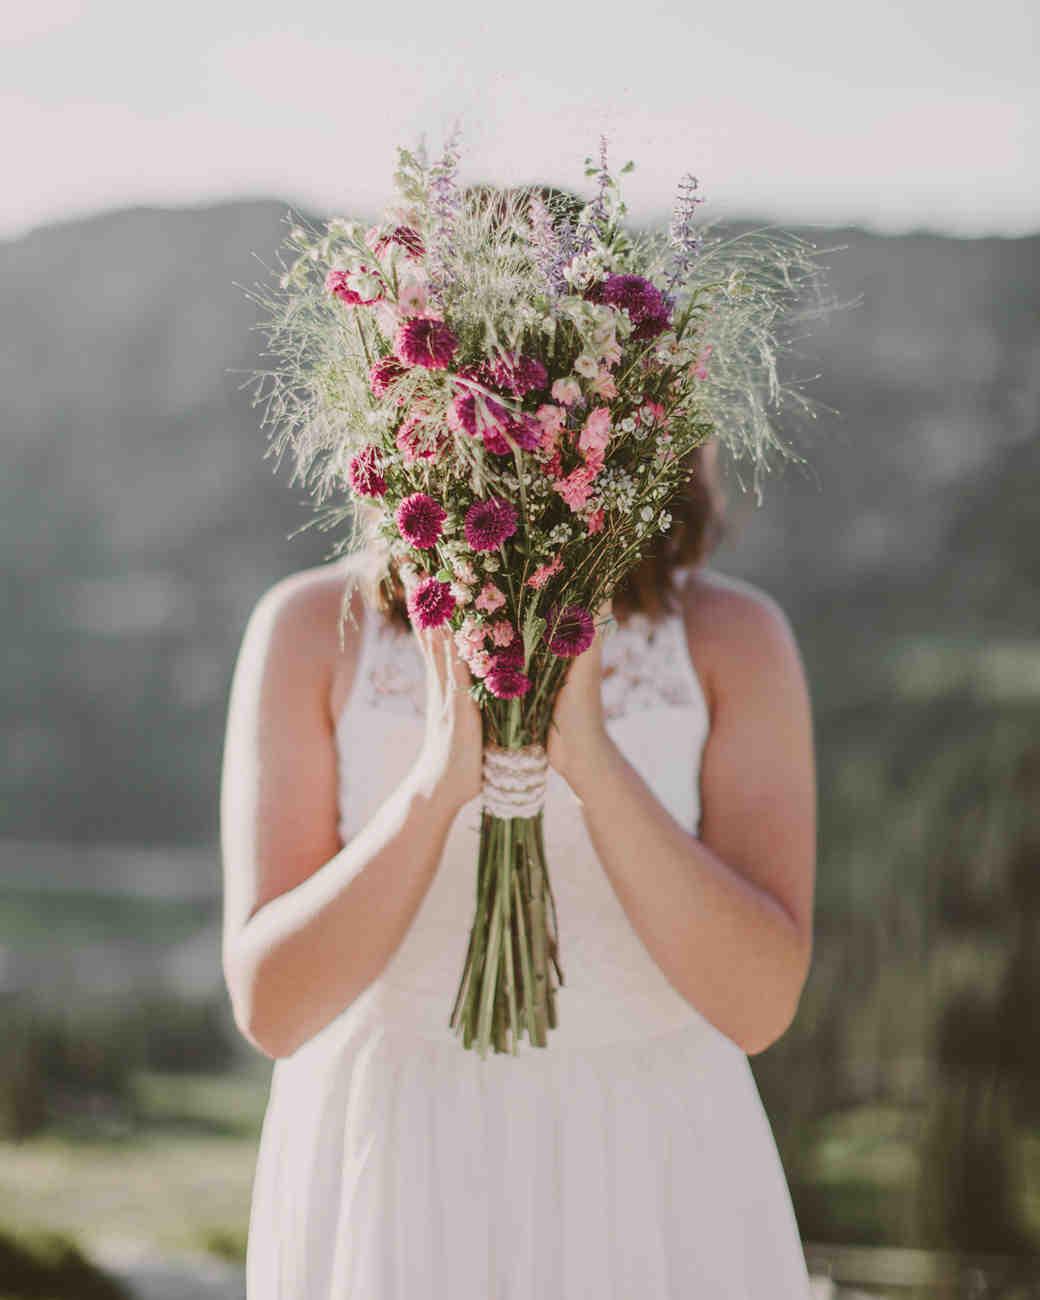 wedding-photo-poses-to-retire-kandice-breinholt-photography-1115.jpg